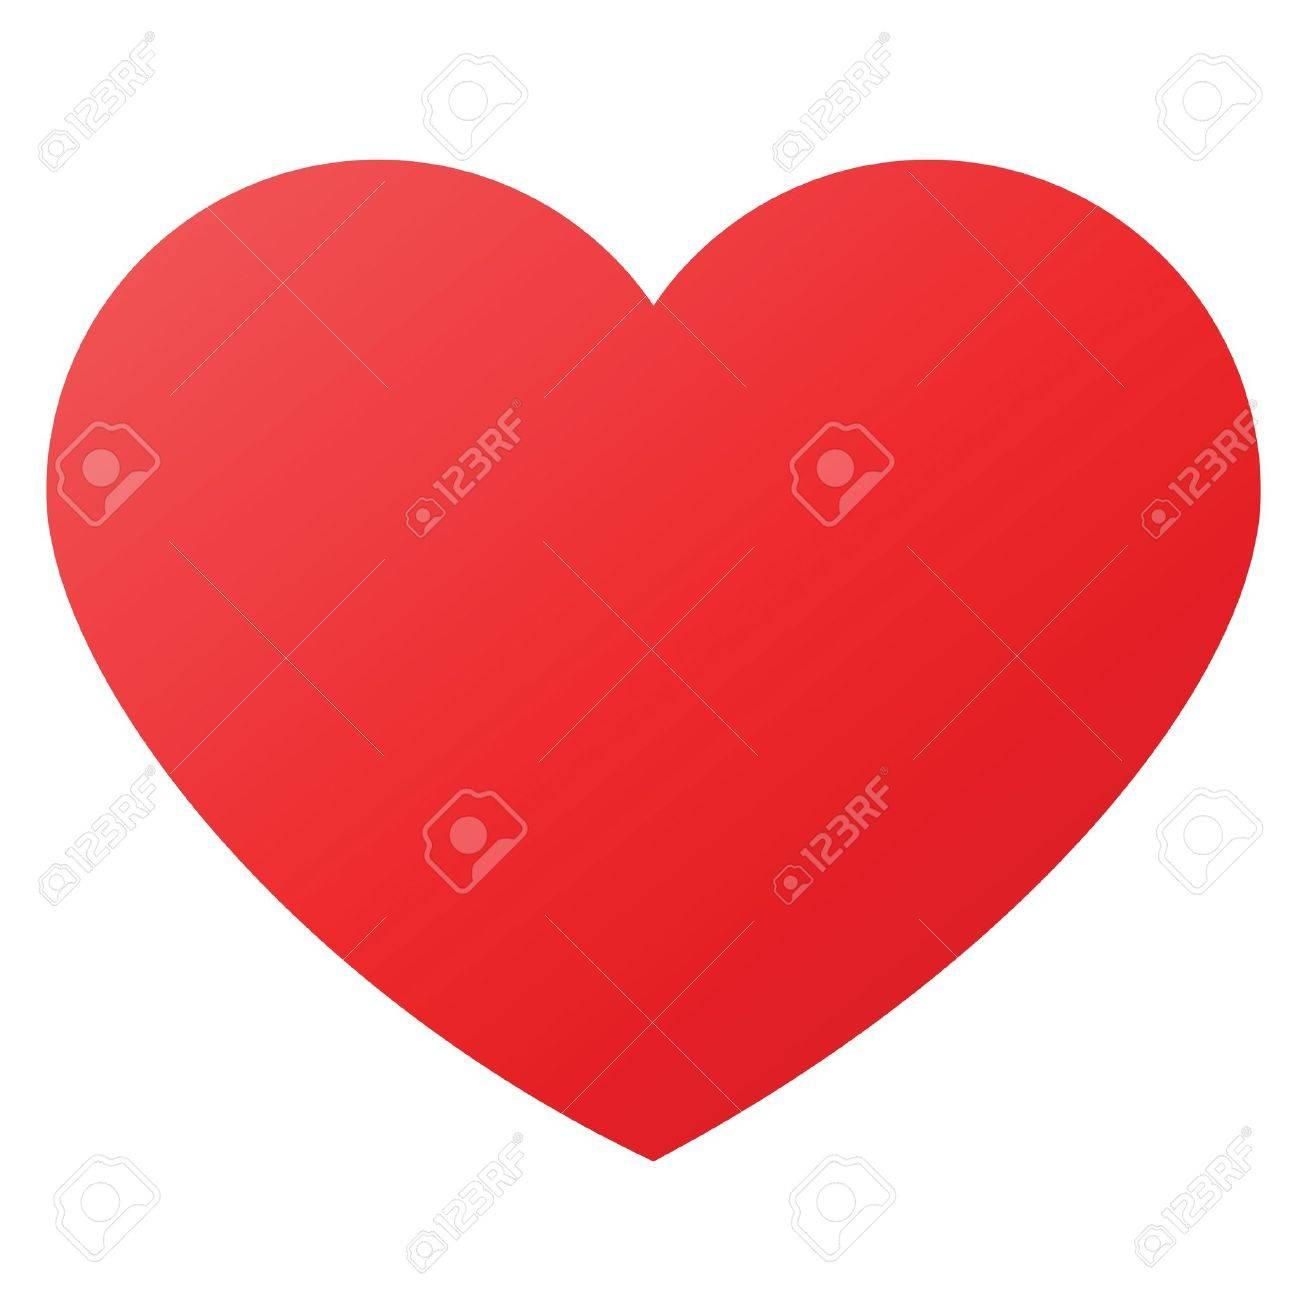 Heart shape design for love symbols royalty free cliparts vectors heart shape design for love symbols stock vector 11823444 buycottarizona Gallery